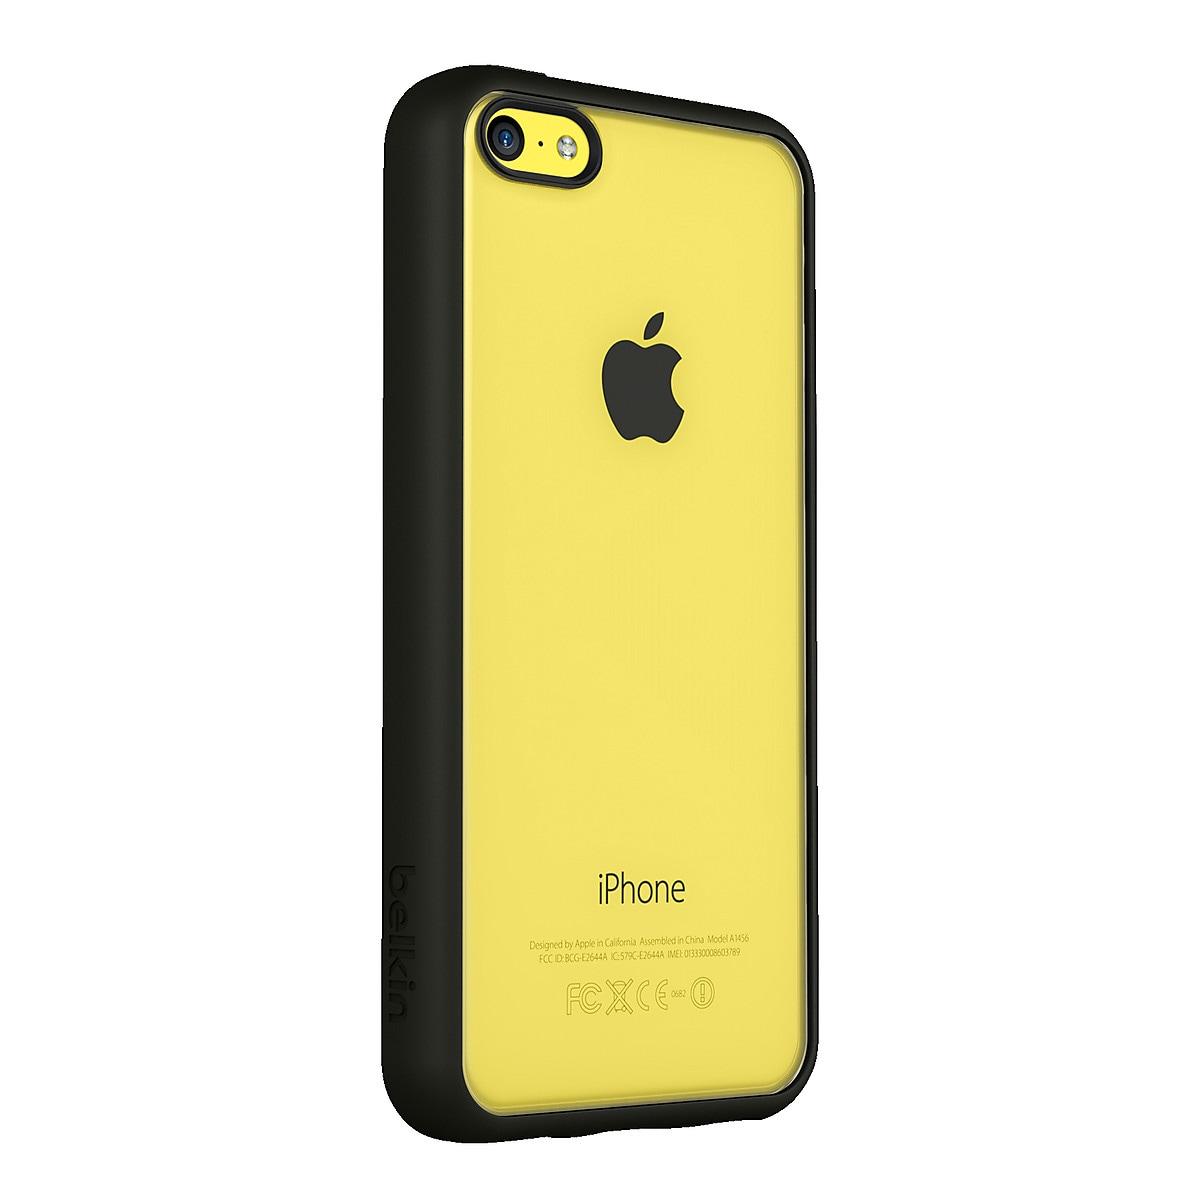 Skal för iPhone 5C, Belkin View Case